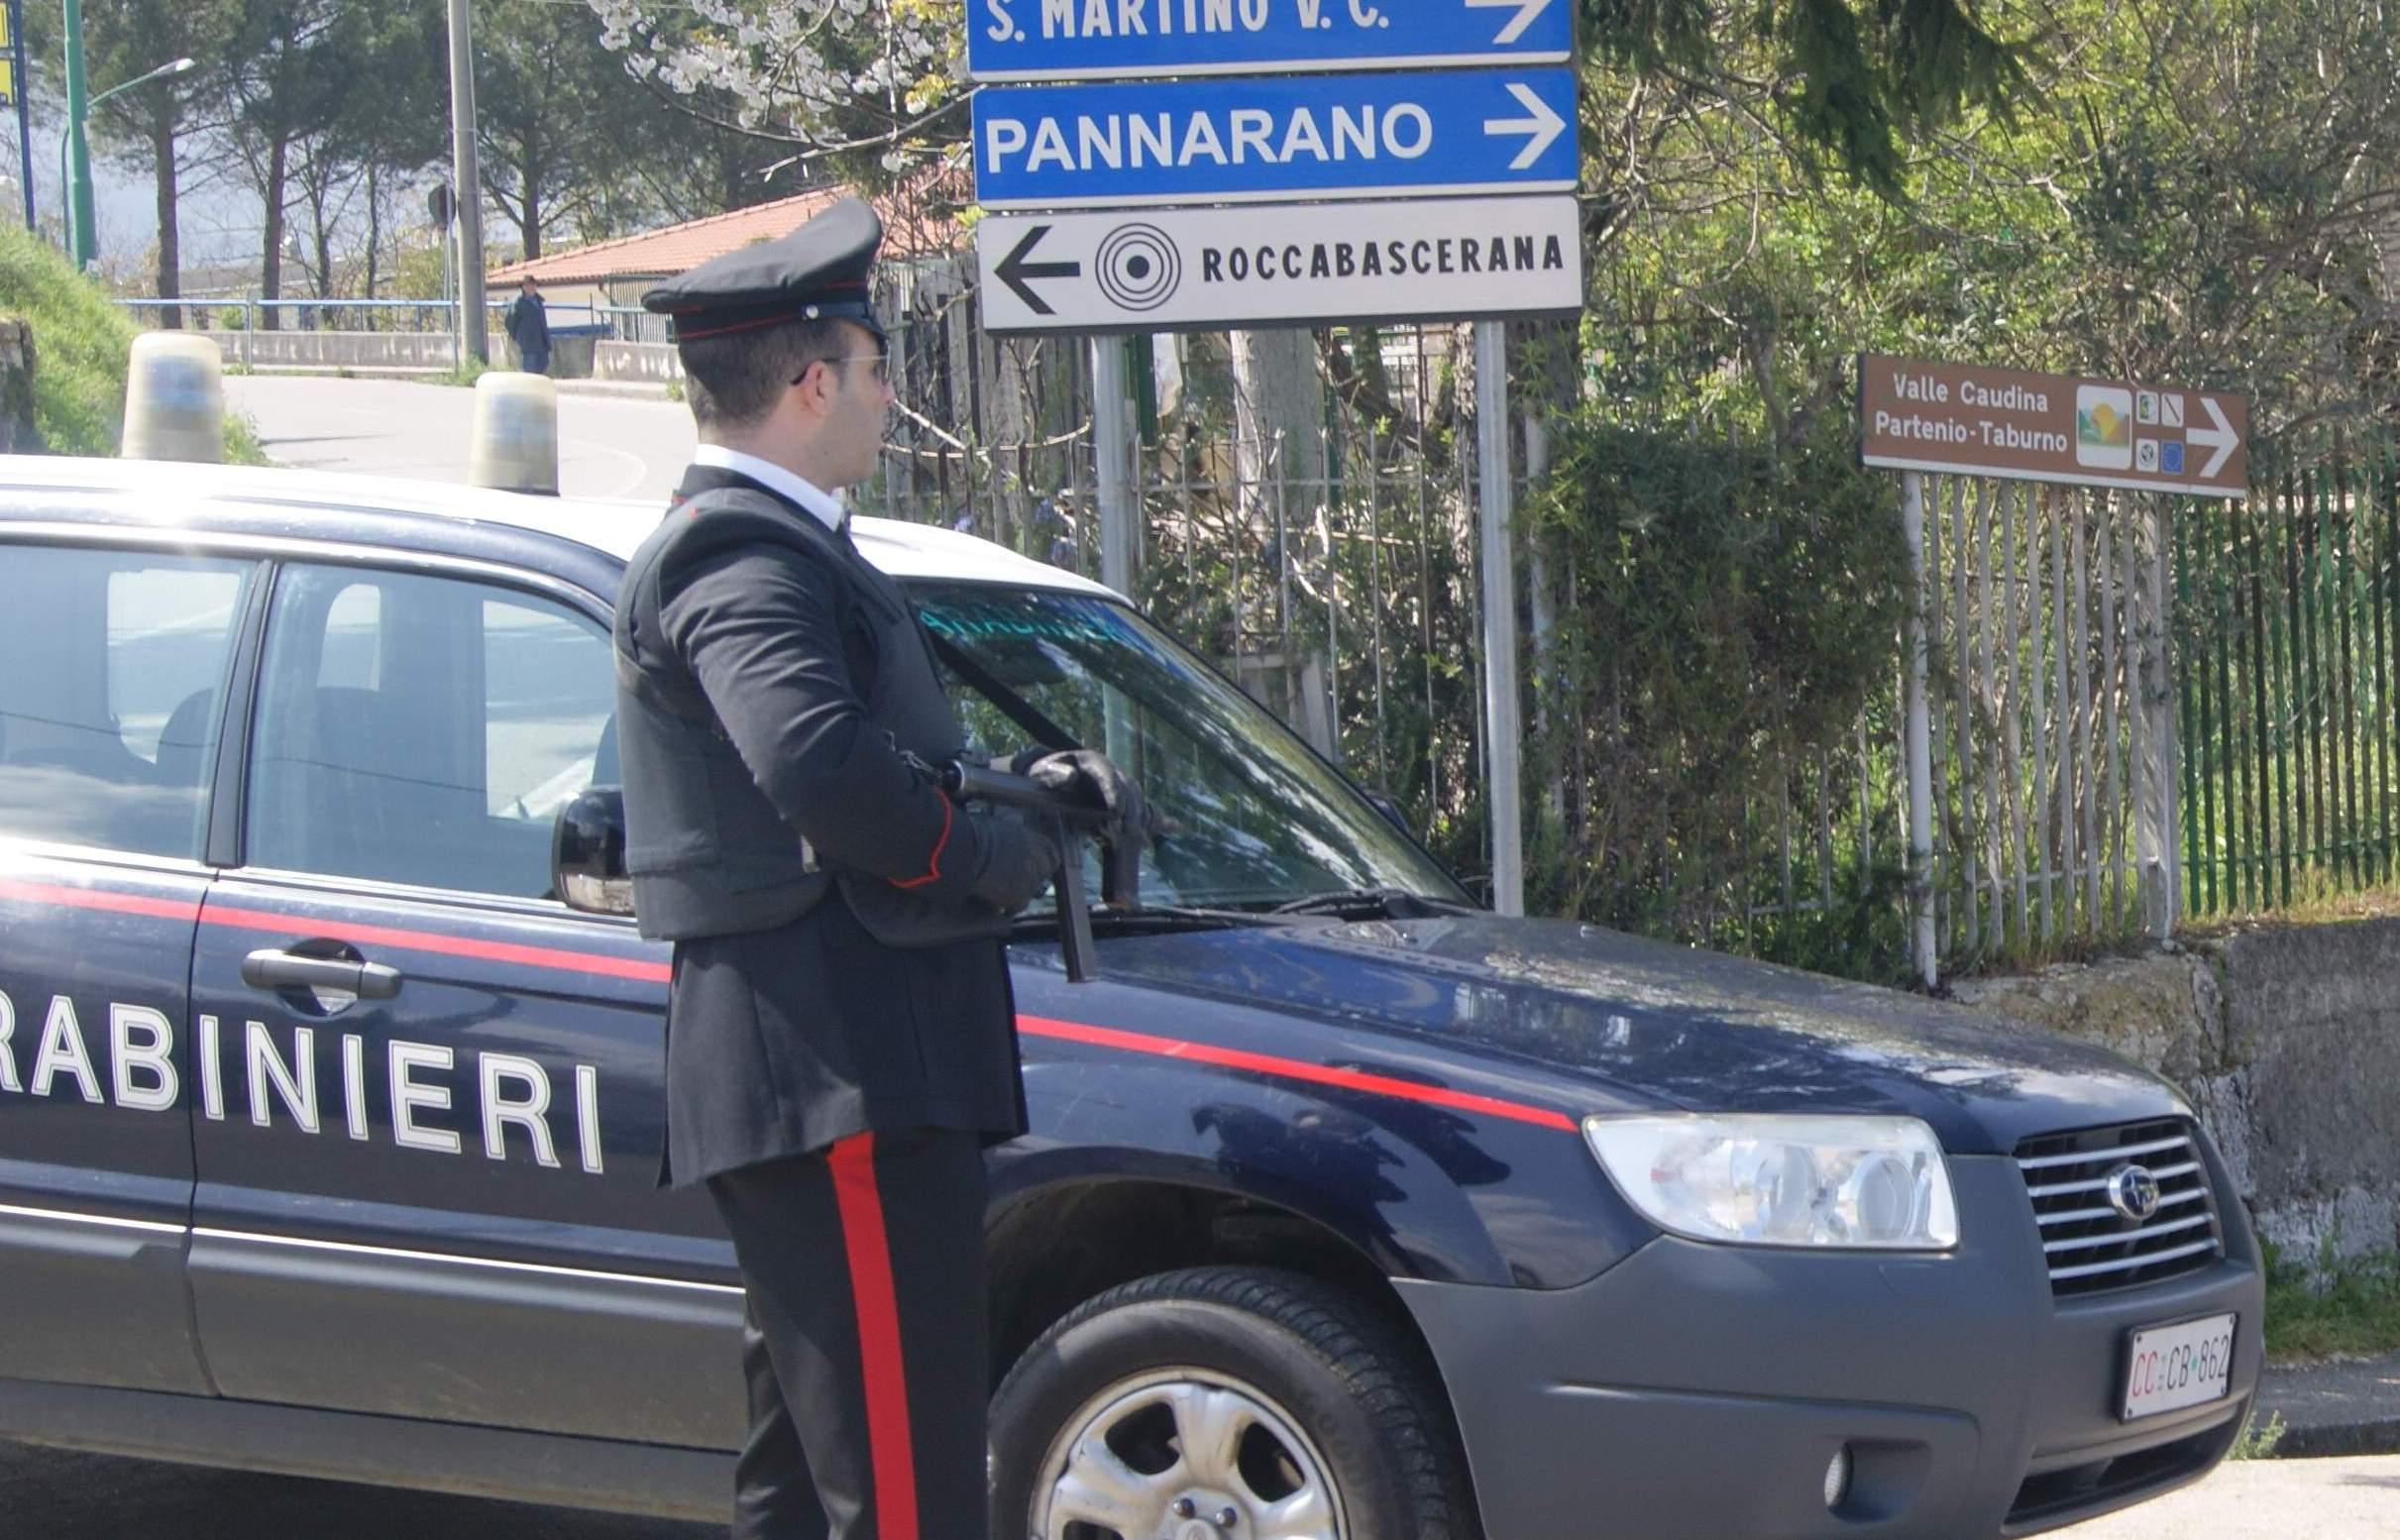 carabinieri roccabascerana